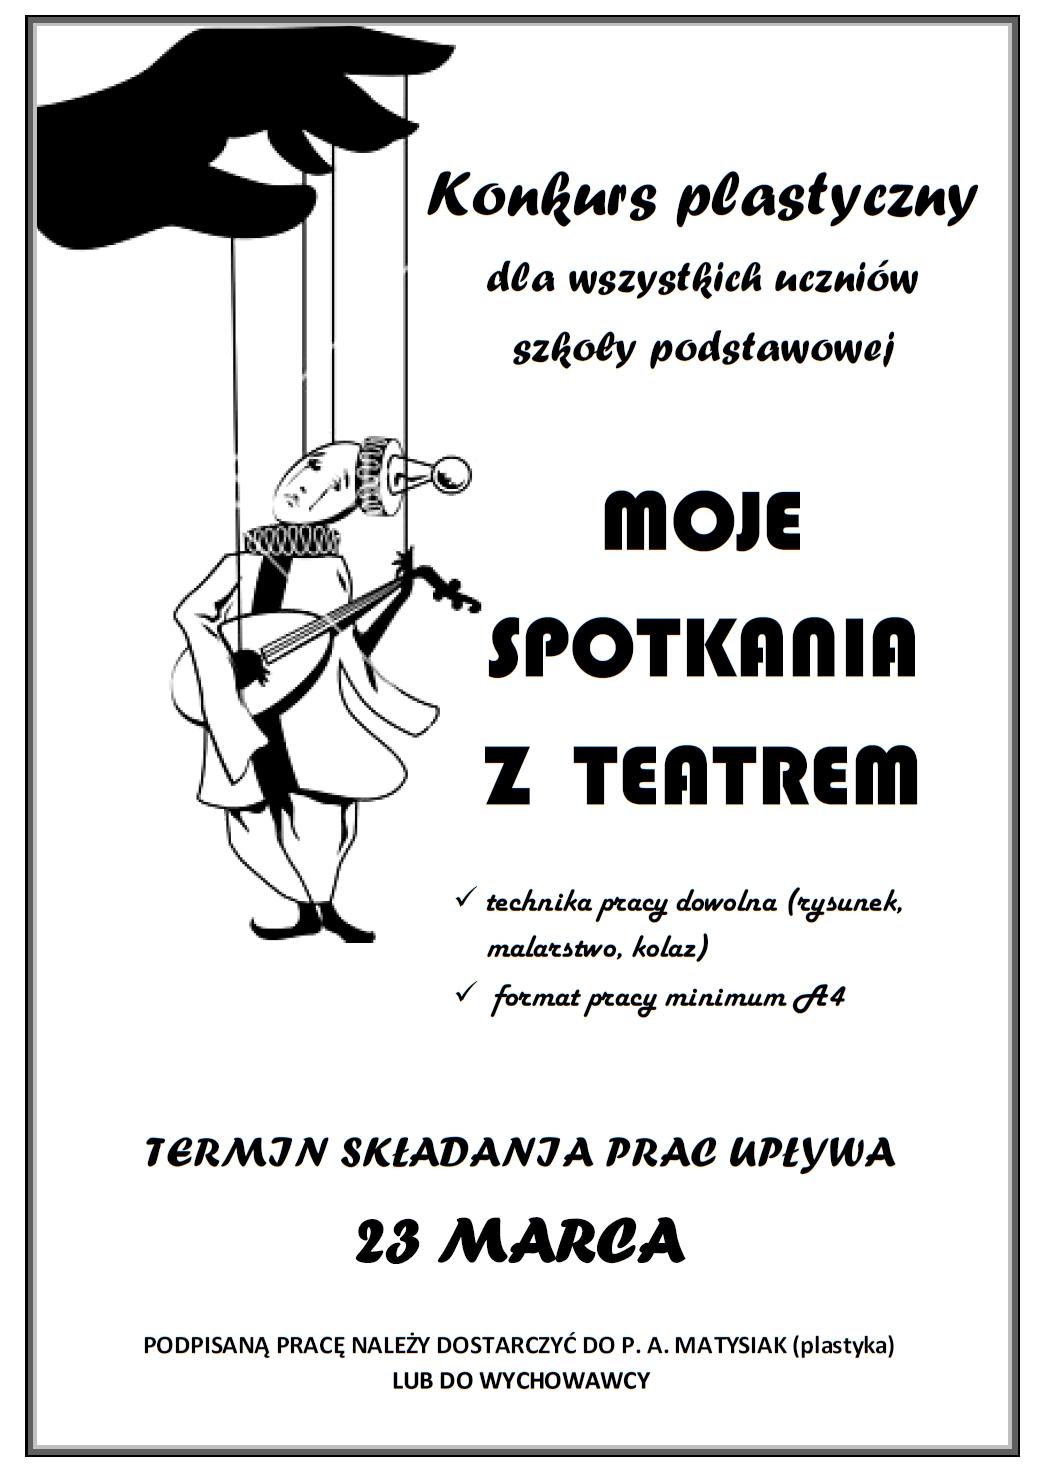 moje_spotkania_z_teatrem_konkurs